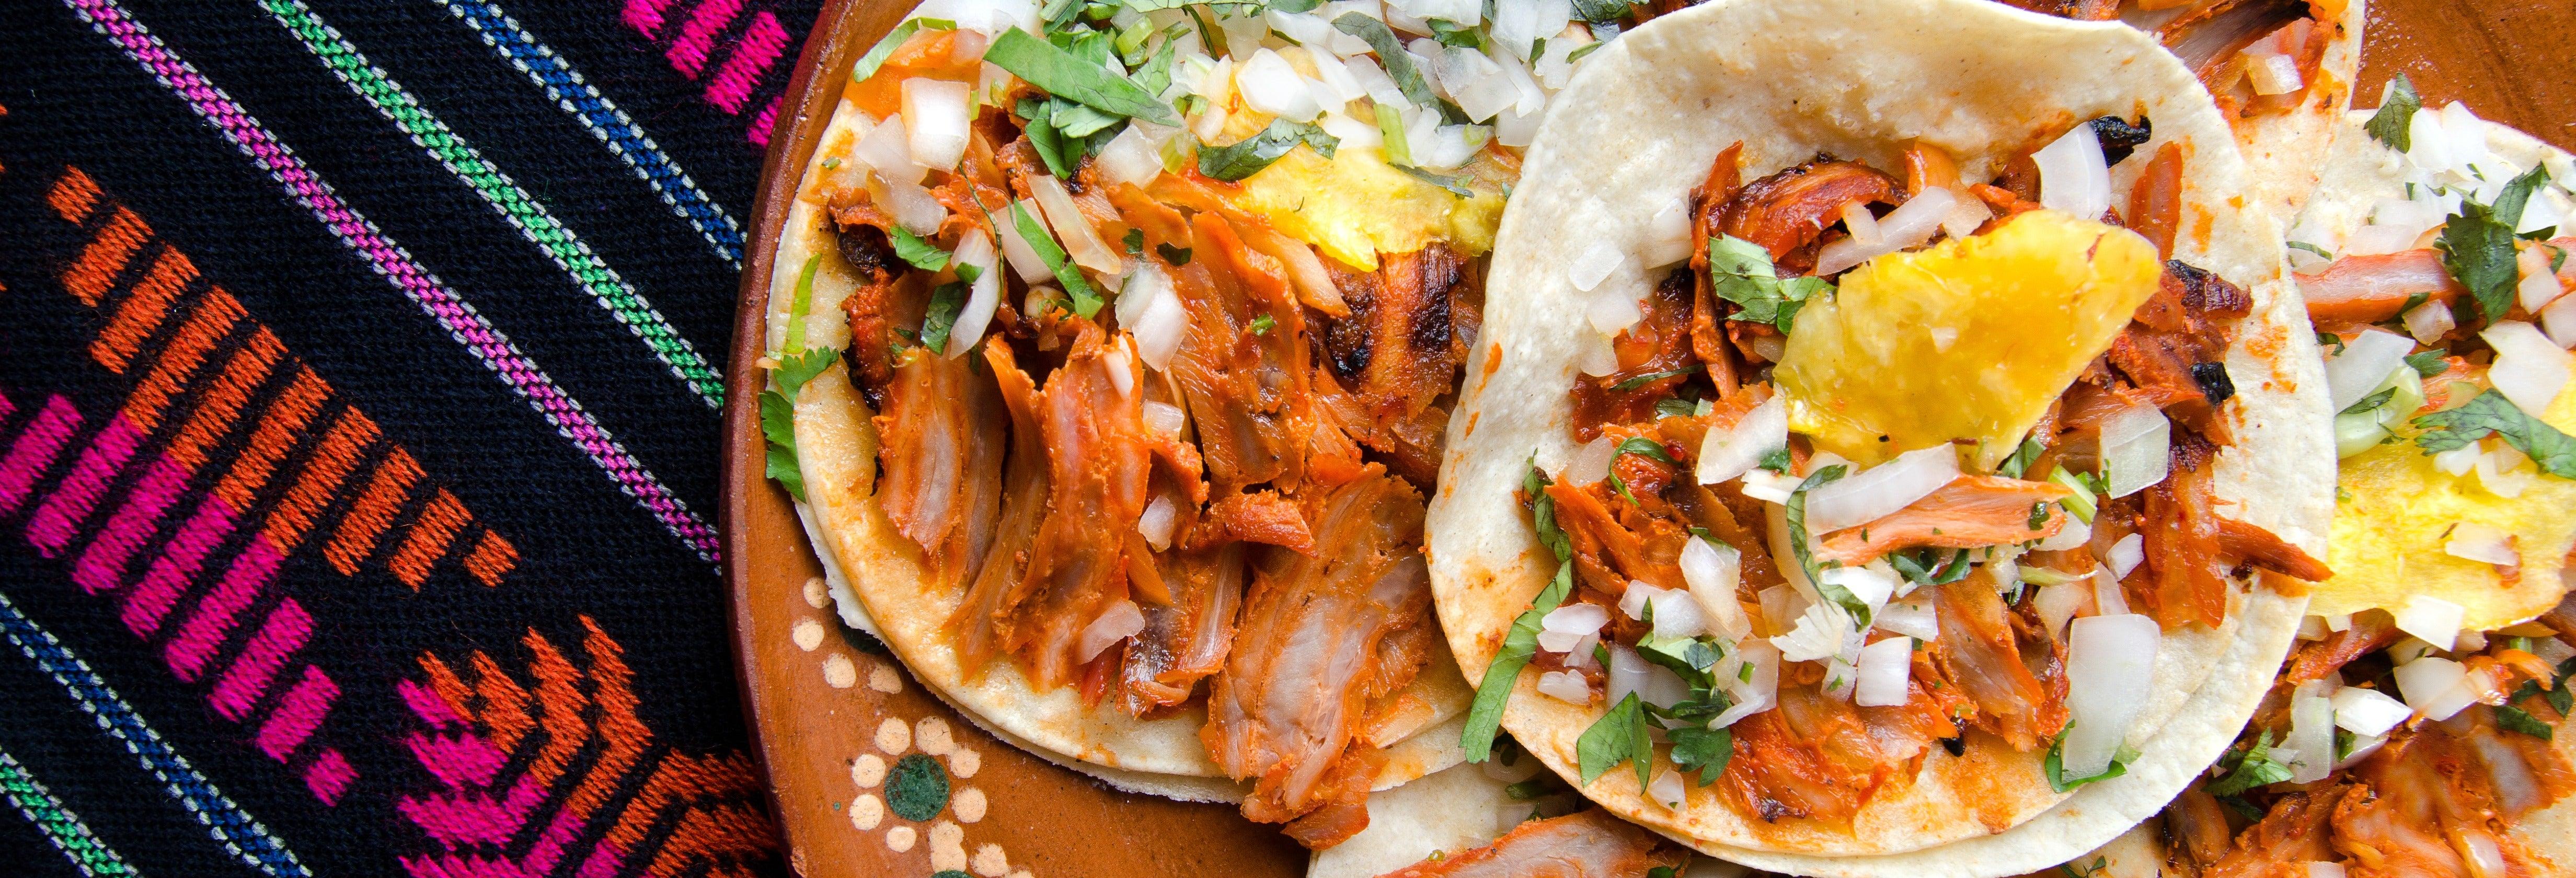 Mexico City Taco Tour: FREE!